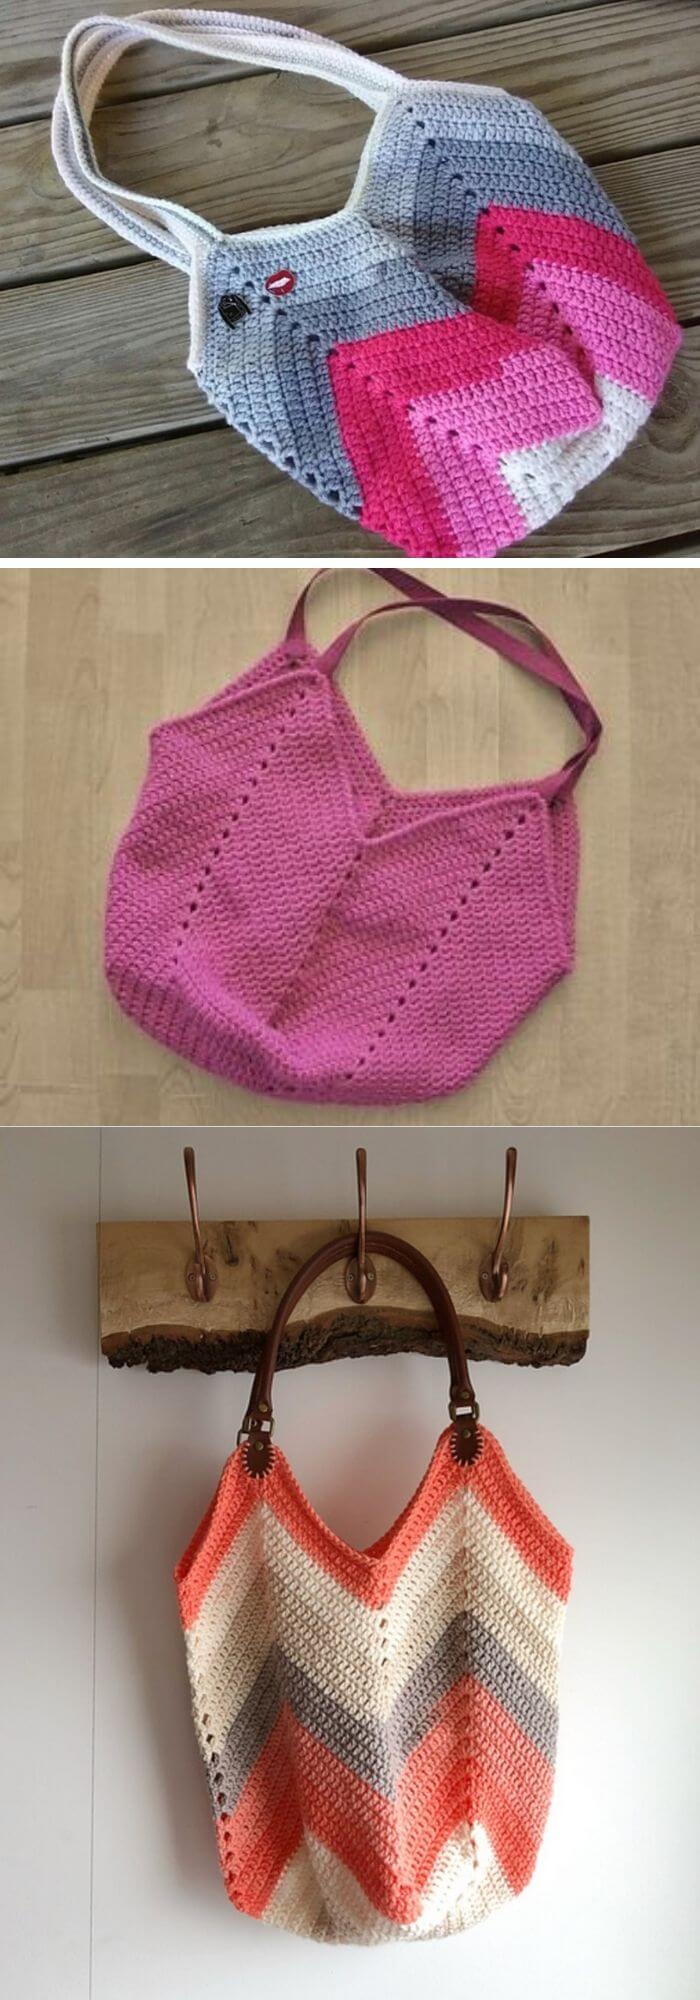 Solid granny square bottom bag